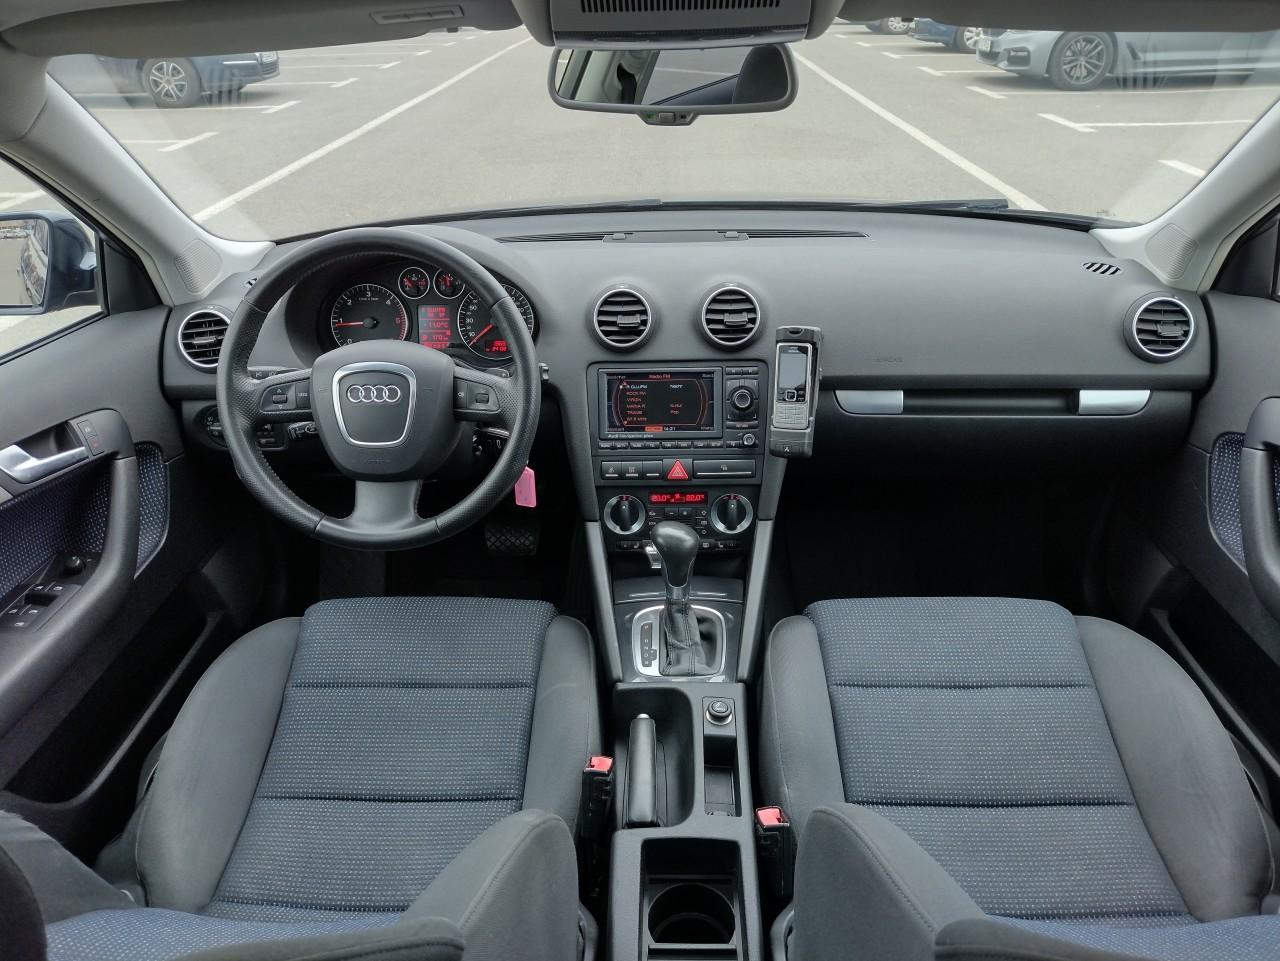 Audi A3 2.0 TDI- 170 CP Automata Xenon Navi Panorama 2008